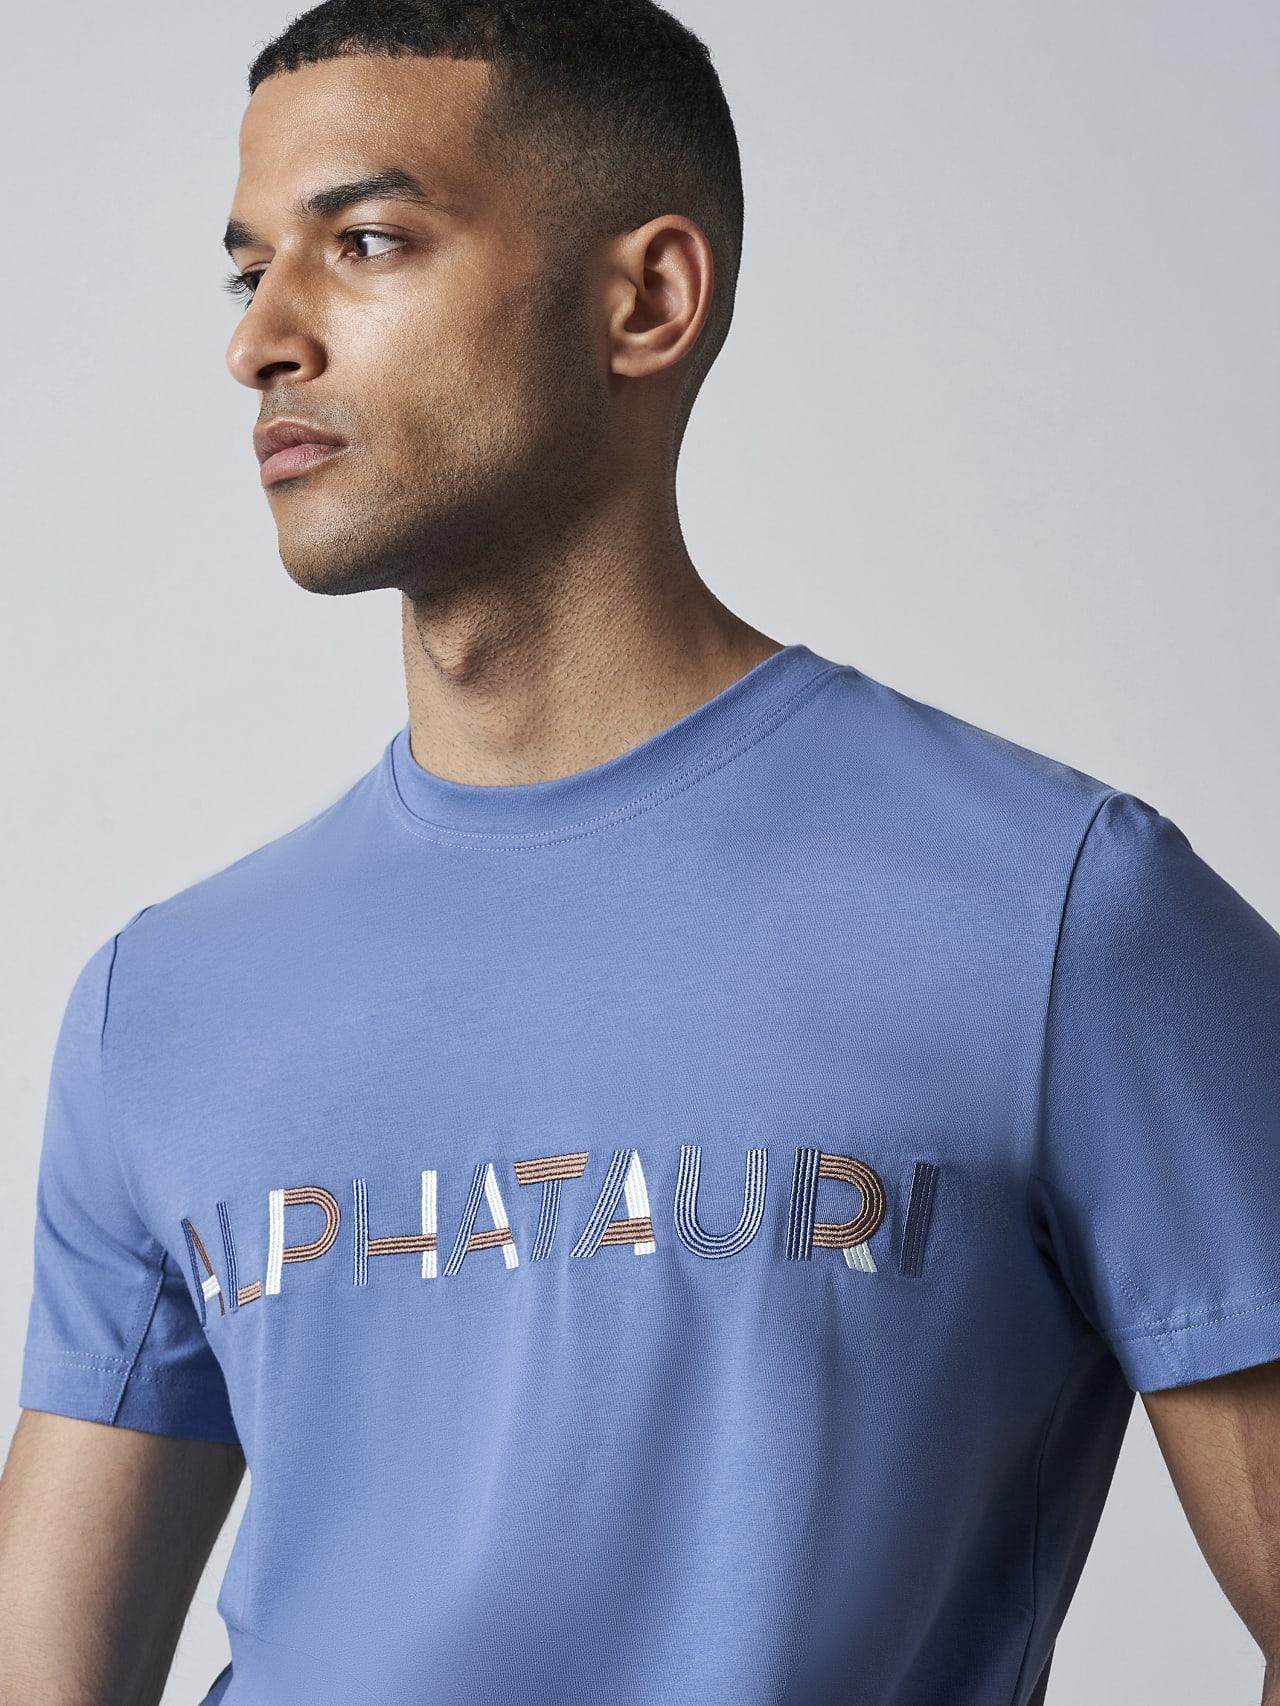 JANOS V3.Y5.02 Logo Embroidery T-Shirt light blue Extra Alpha Tauri